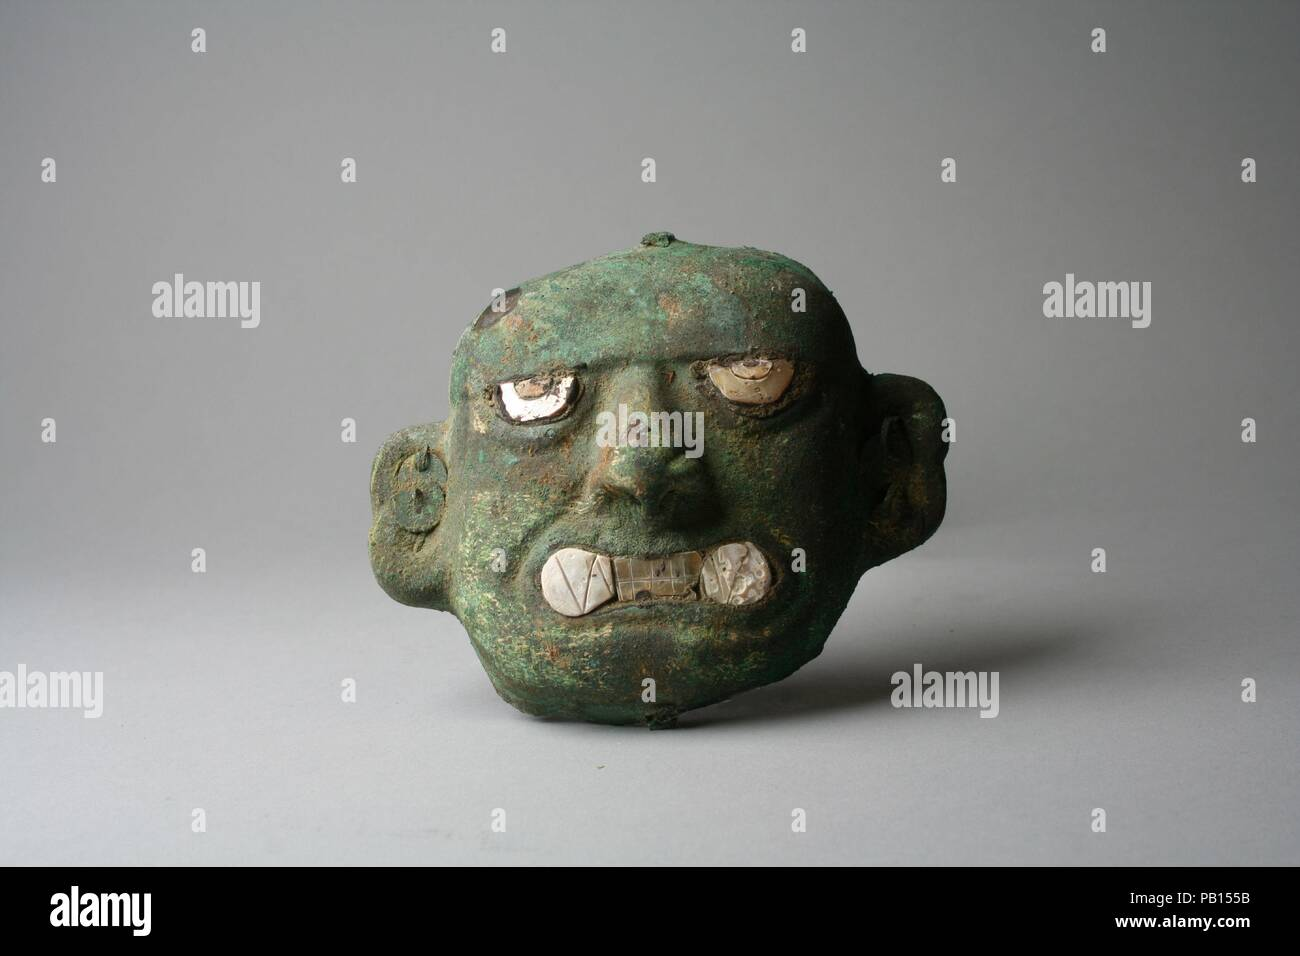 Face Mask Ornament. Culture: Moche (Loma Negra). Dimensions: H x W: 3 3/16 x 3 7/8in. (8.1 x 9.8cm). Date: 390-450. Museum: Metropolitan Museum of Art, New York, USA. Stock Photo